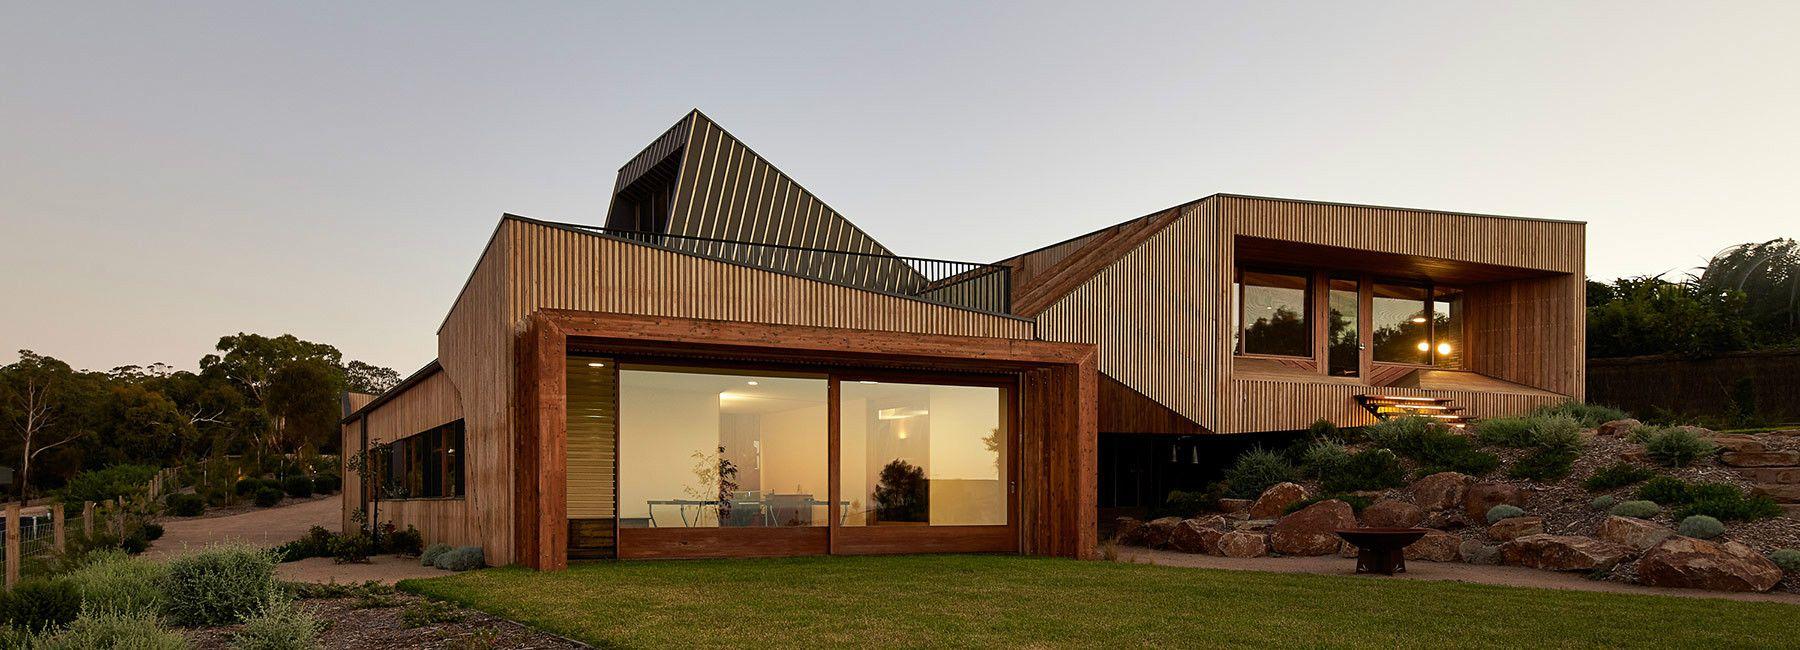 nice Split House   BKK Architects Check more at http://www.arch2o.com/split-house-bkk-architects/